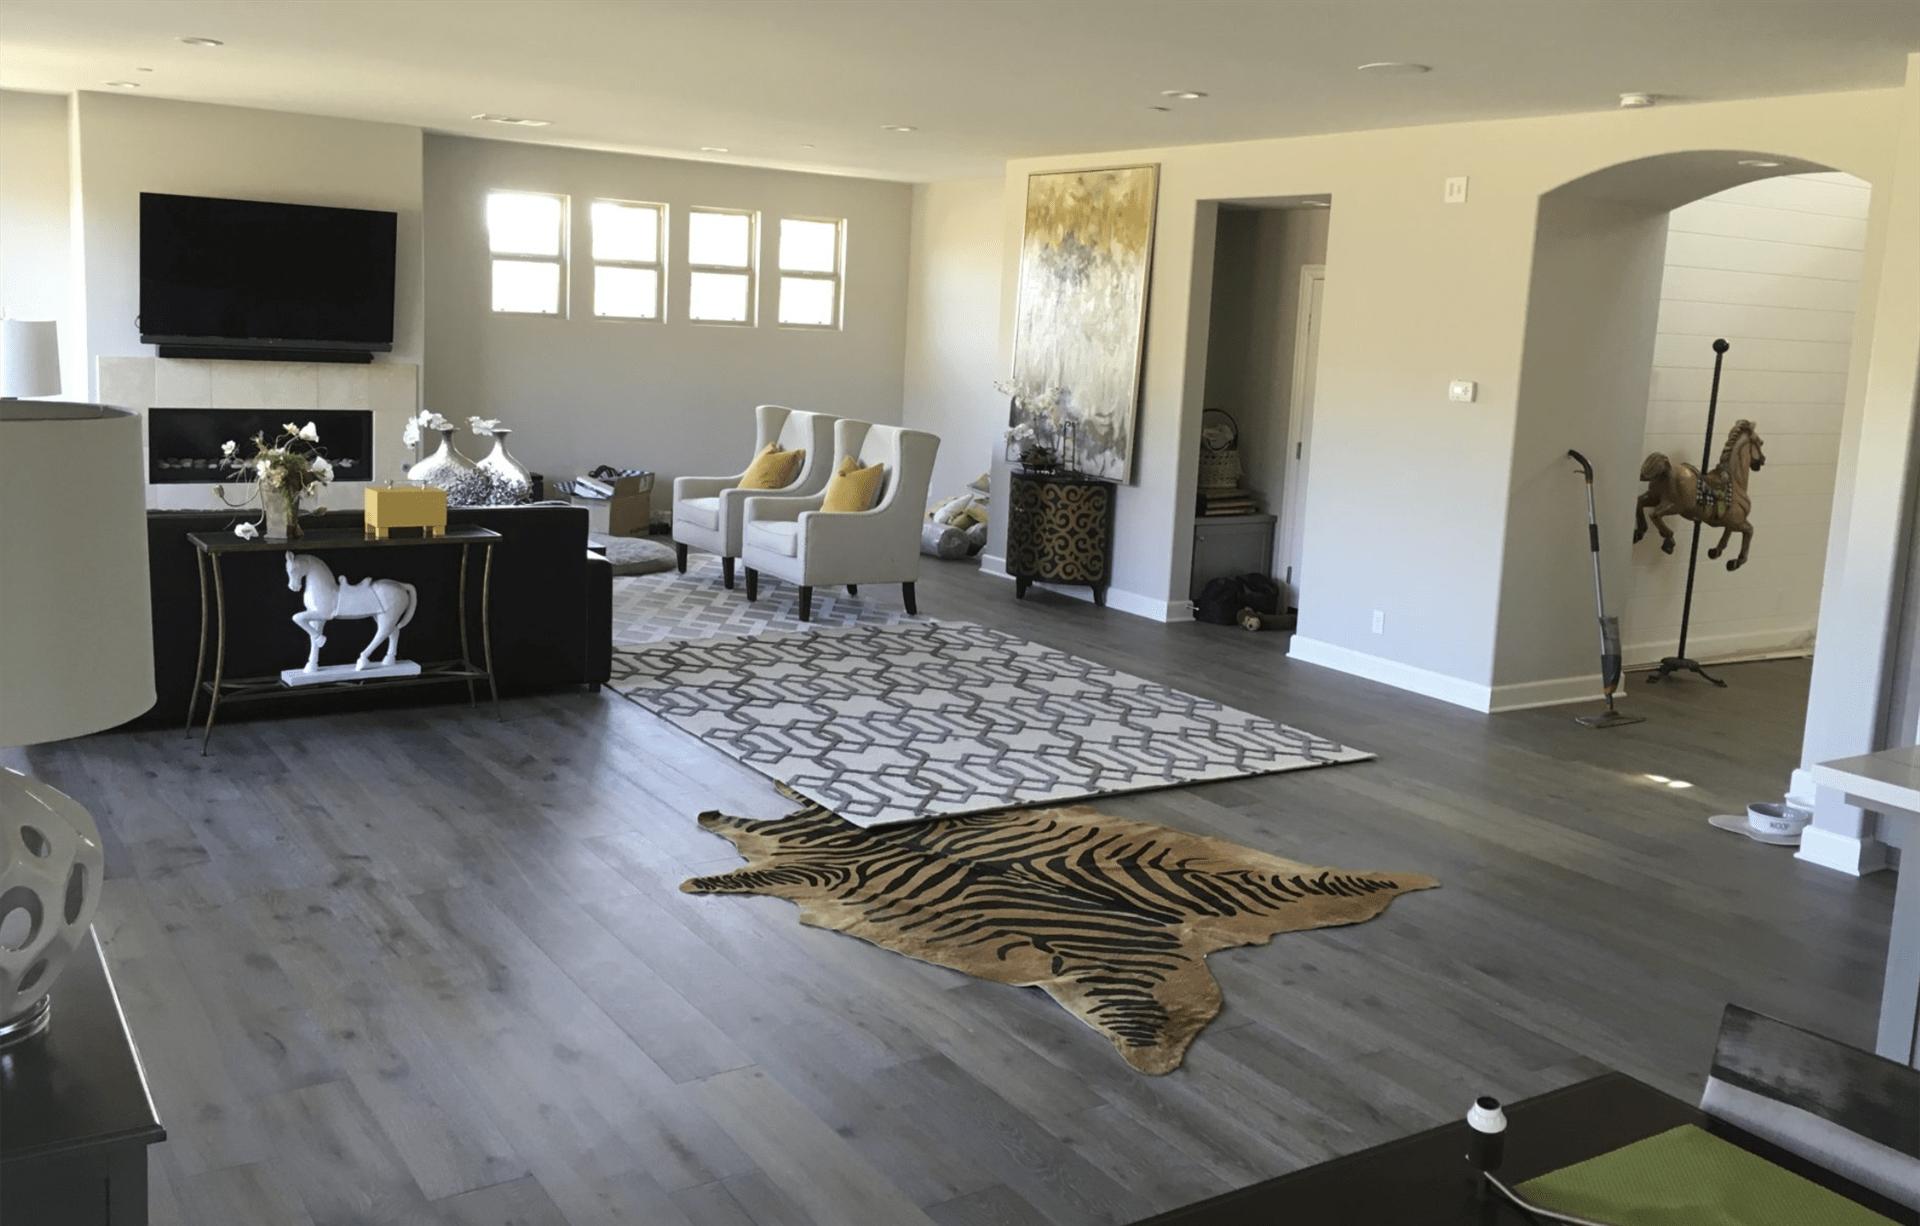 Open living space design in Fullerton, CA from TS Home Design Center / Rite Loom Flooring